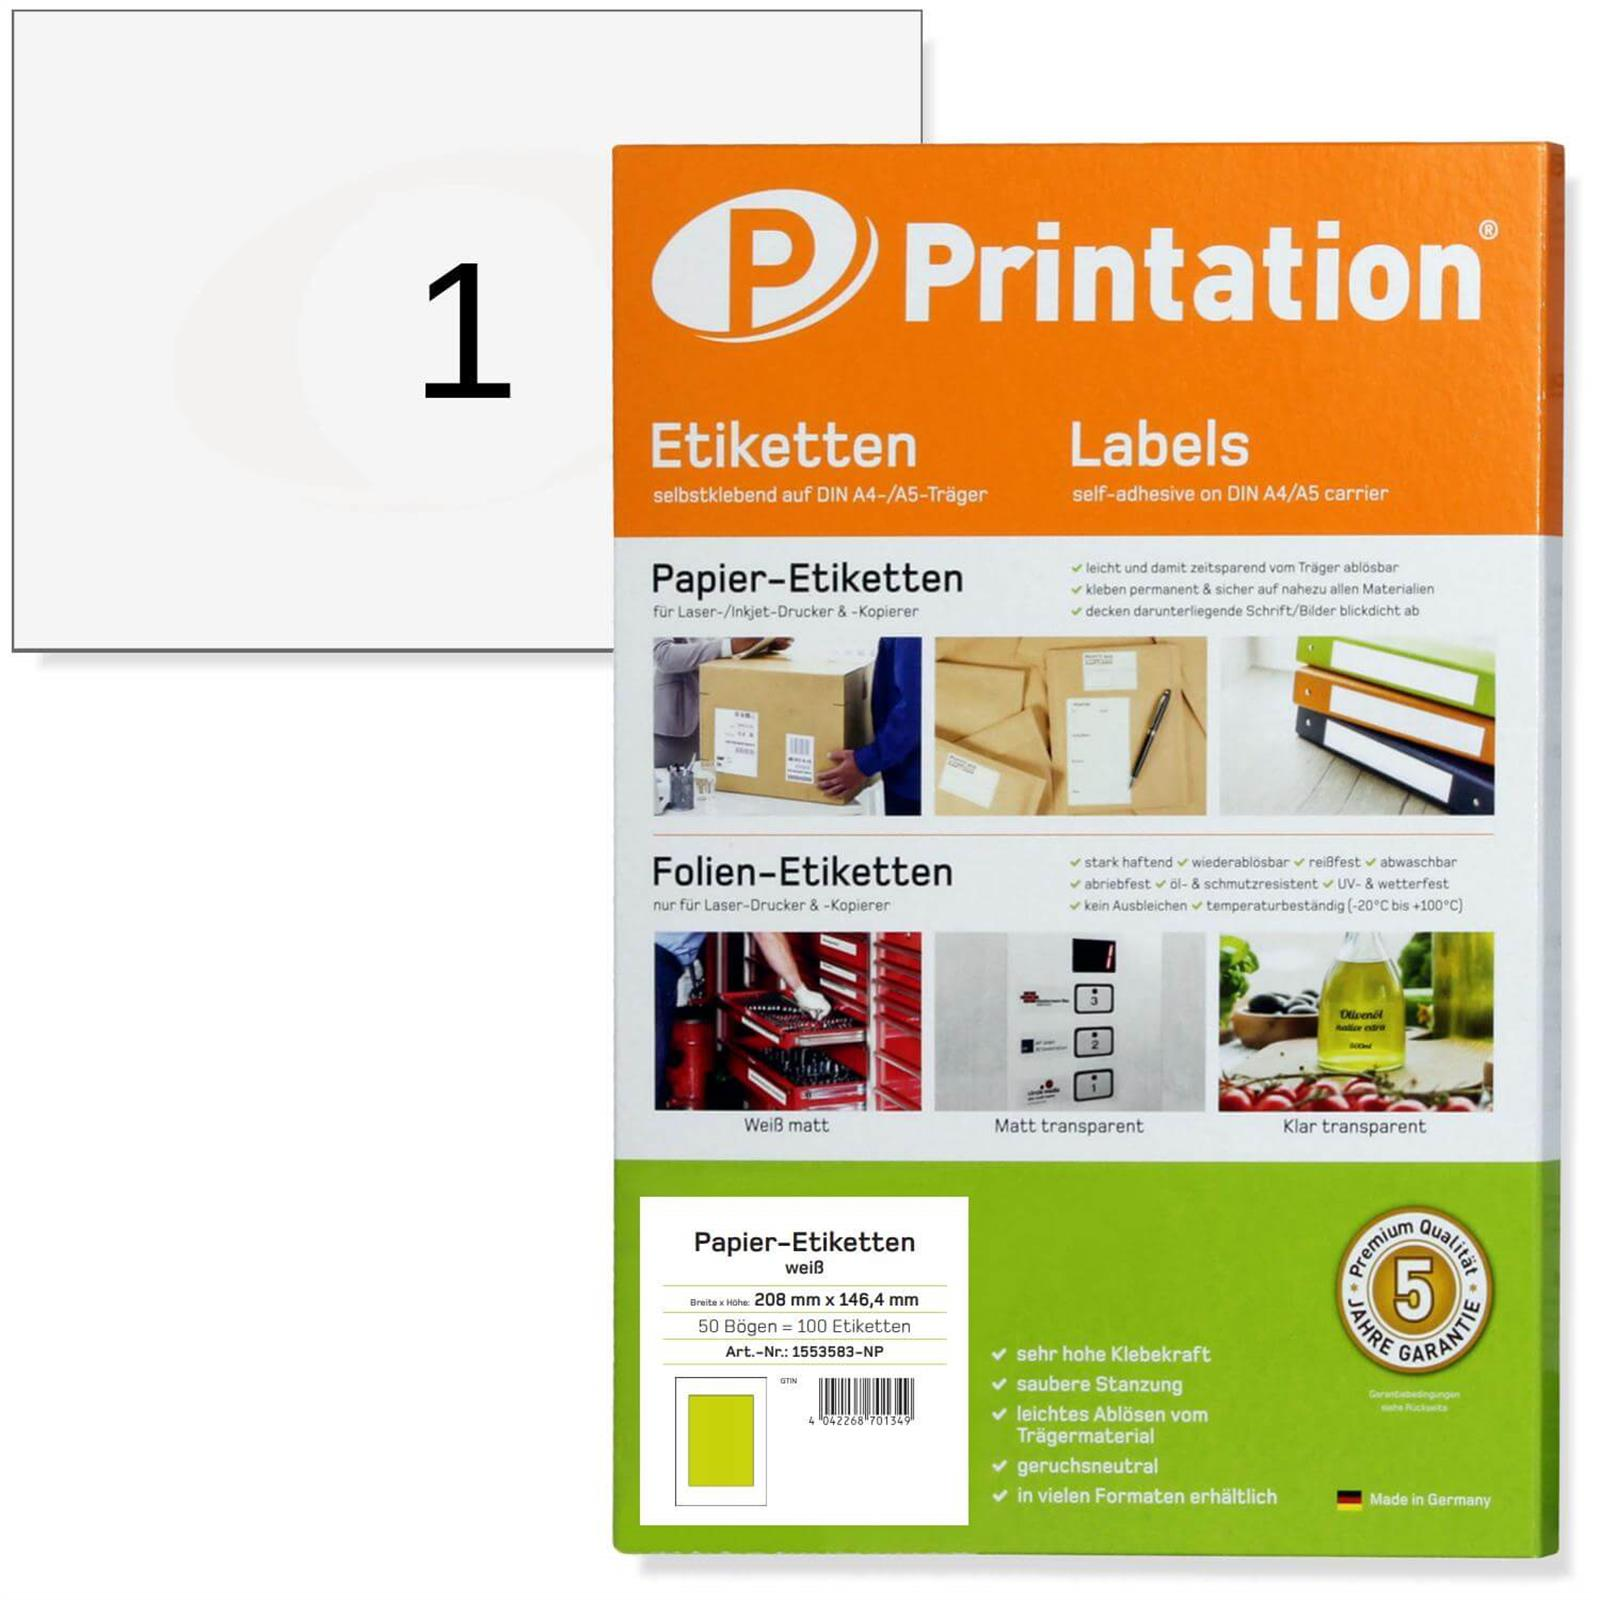 Printation Din A5 210 X 148 Etiketten 200 210x148 Dhl